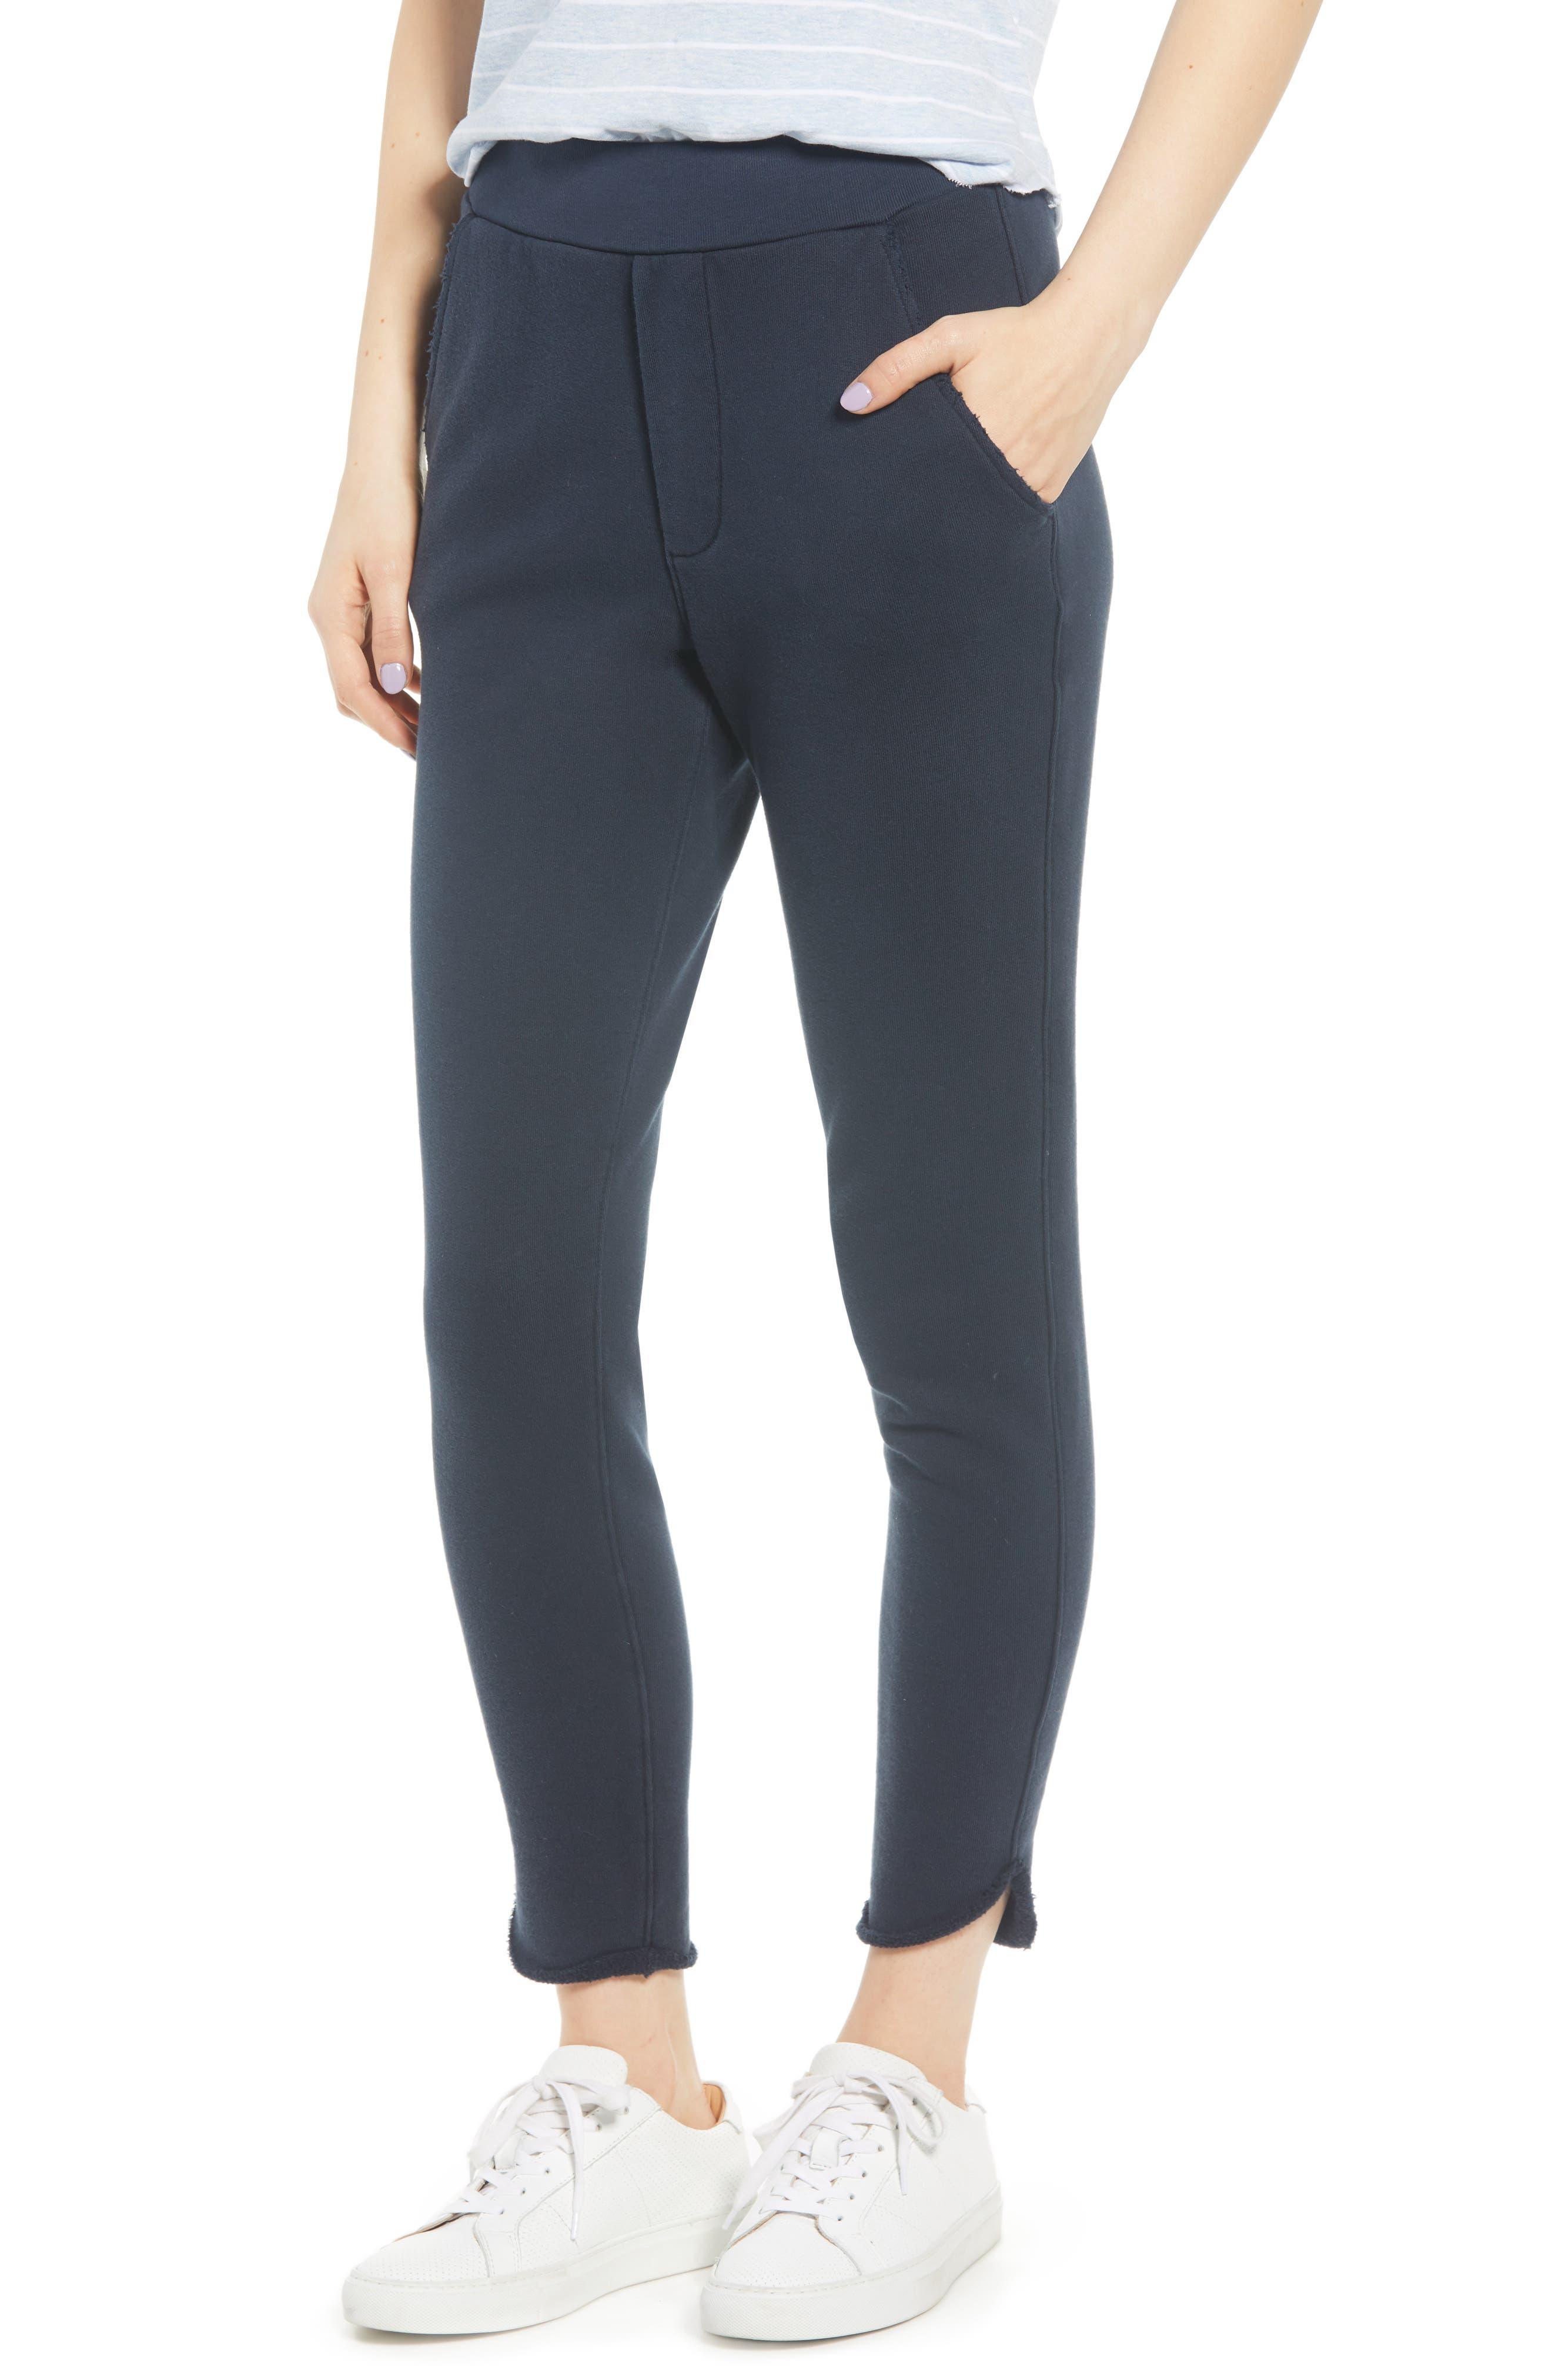 Frank & Eileen Tee Lab The Trouser Sweatpants, Blue